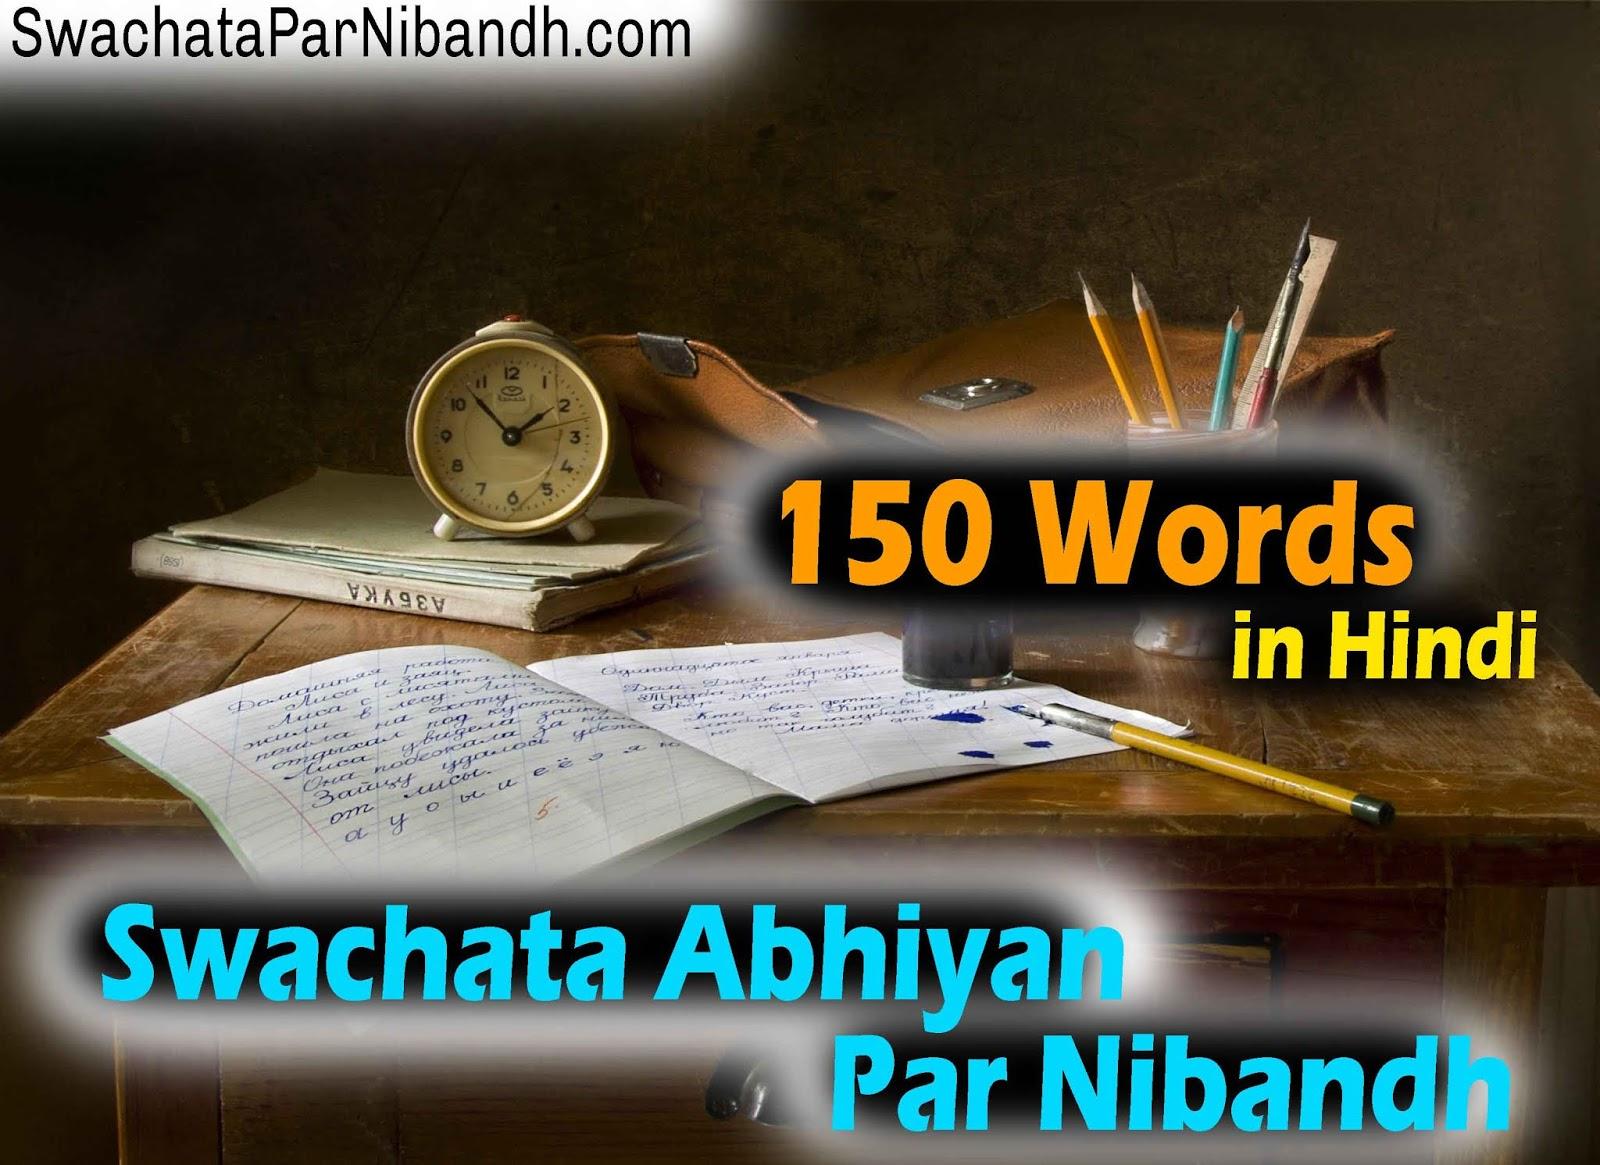 Swachata Abhiyan Par Nibandh 150 Shabdo Mein, Swachh Bharat Abhiyan Par Nibandh, Swachh Bharat Abhiyan Par Nibandh 150 Shabdo Mein, स्वच्छ भारत अभियान निबंध,